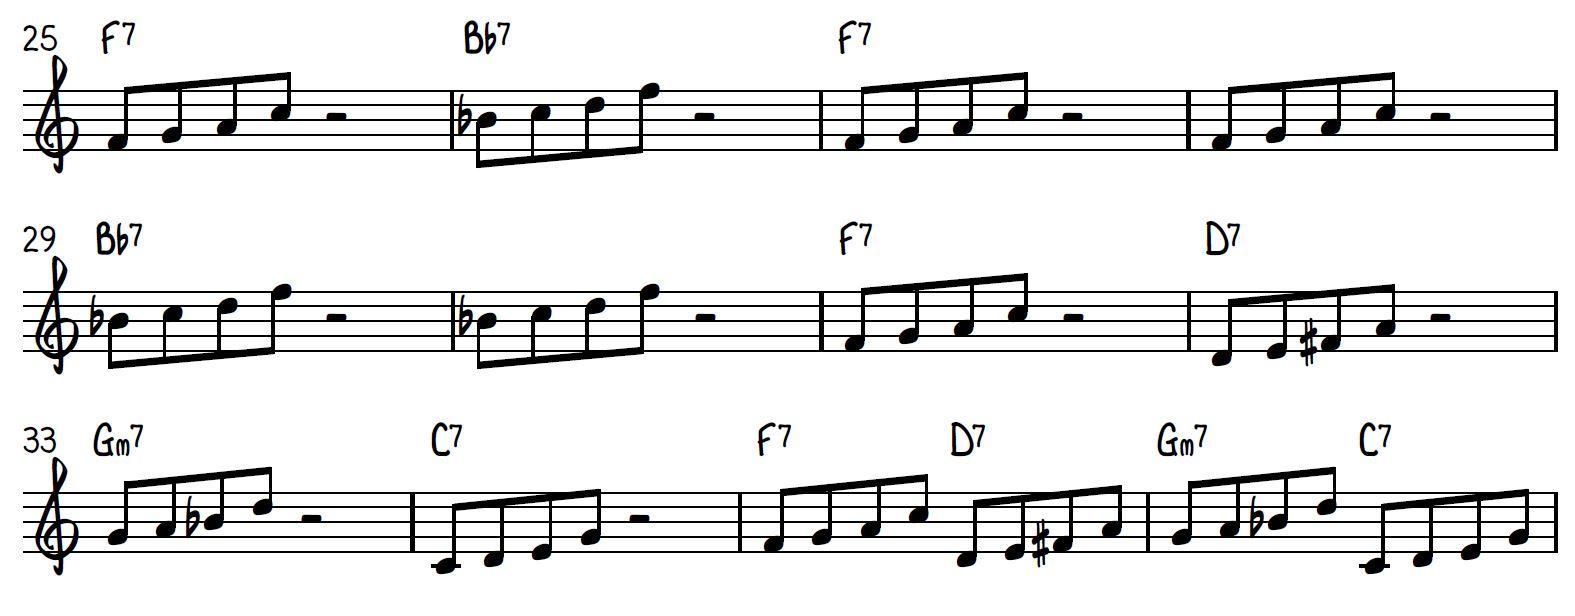 Building jazz vocabulary: The Rock Climber Part 1